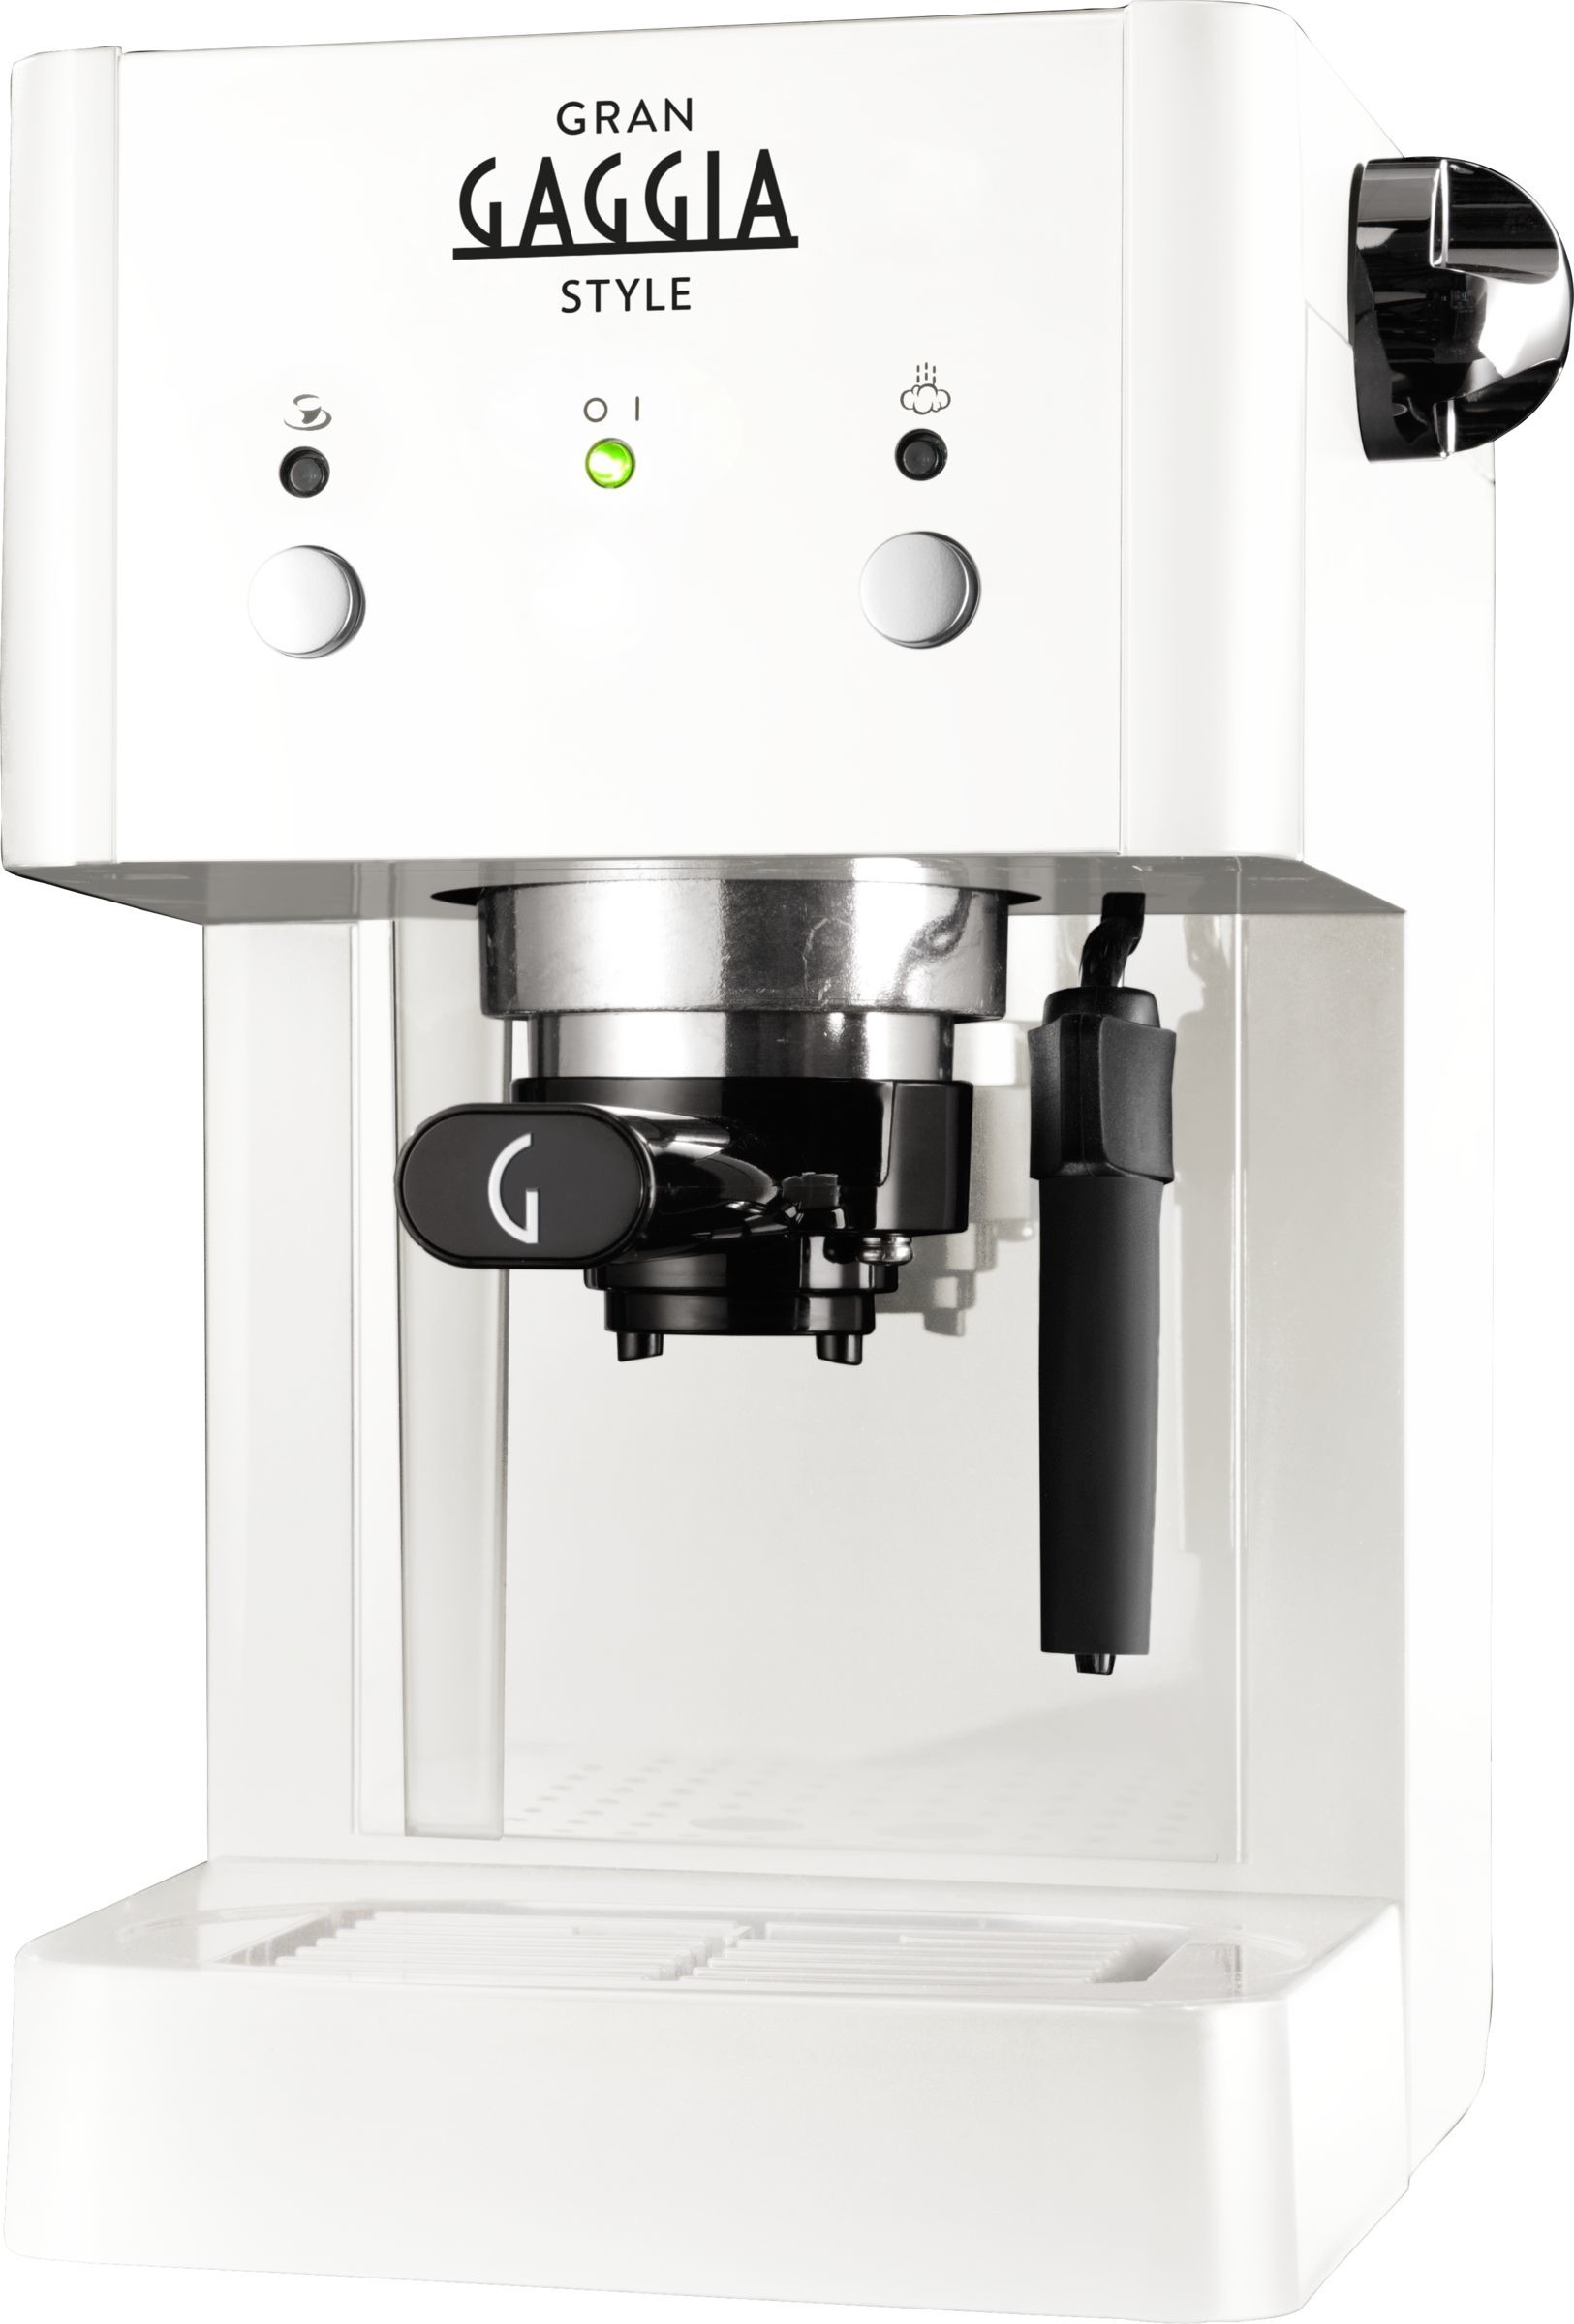 Gaggia espresso apparaat Gran wit